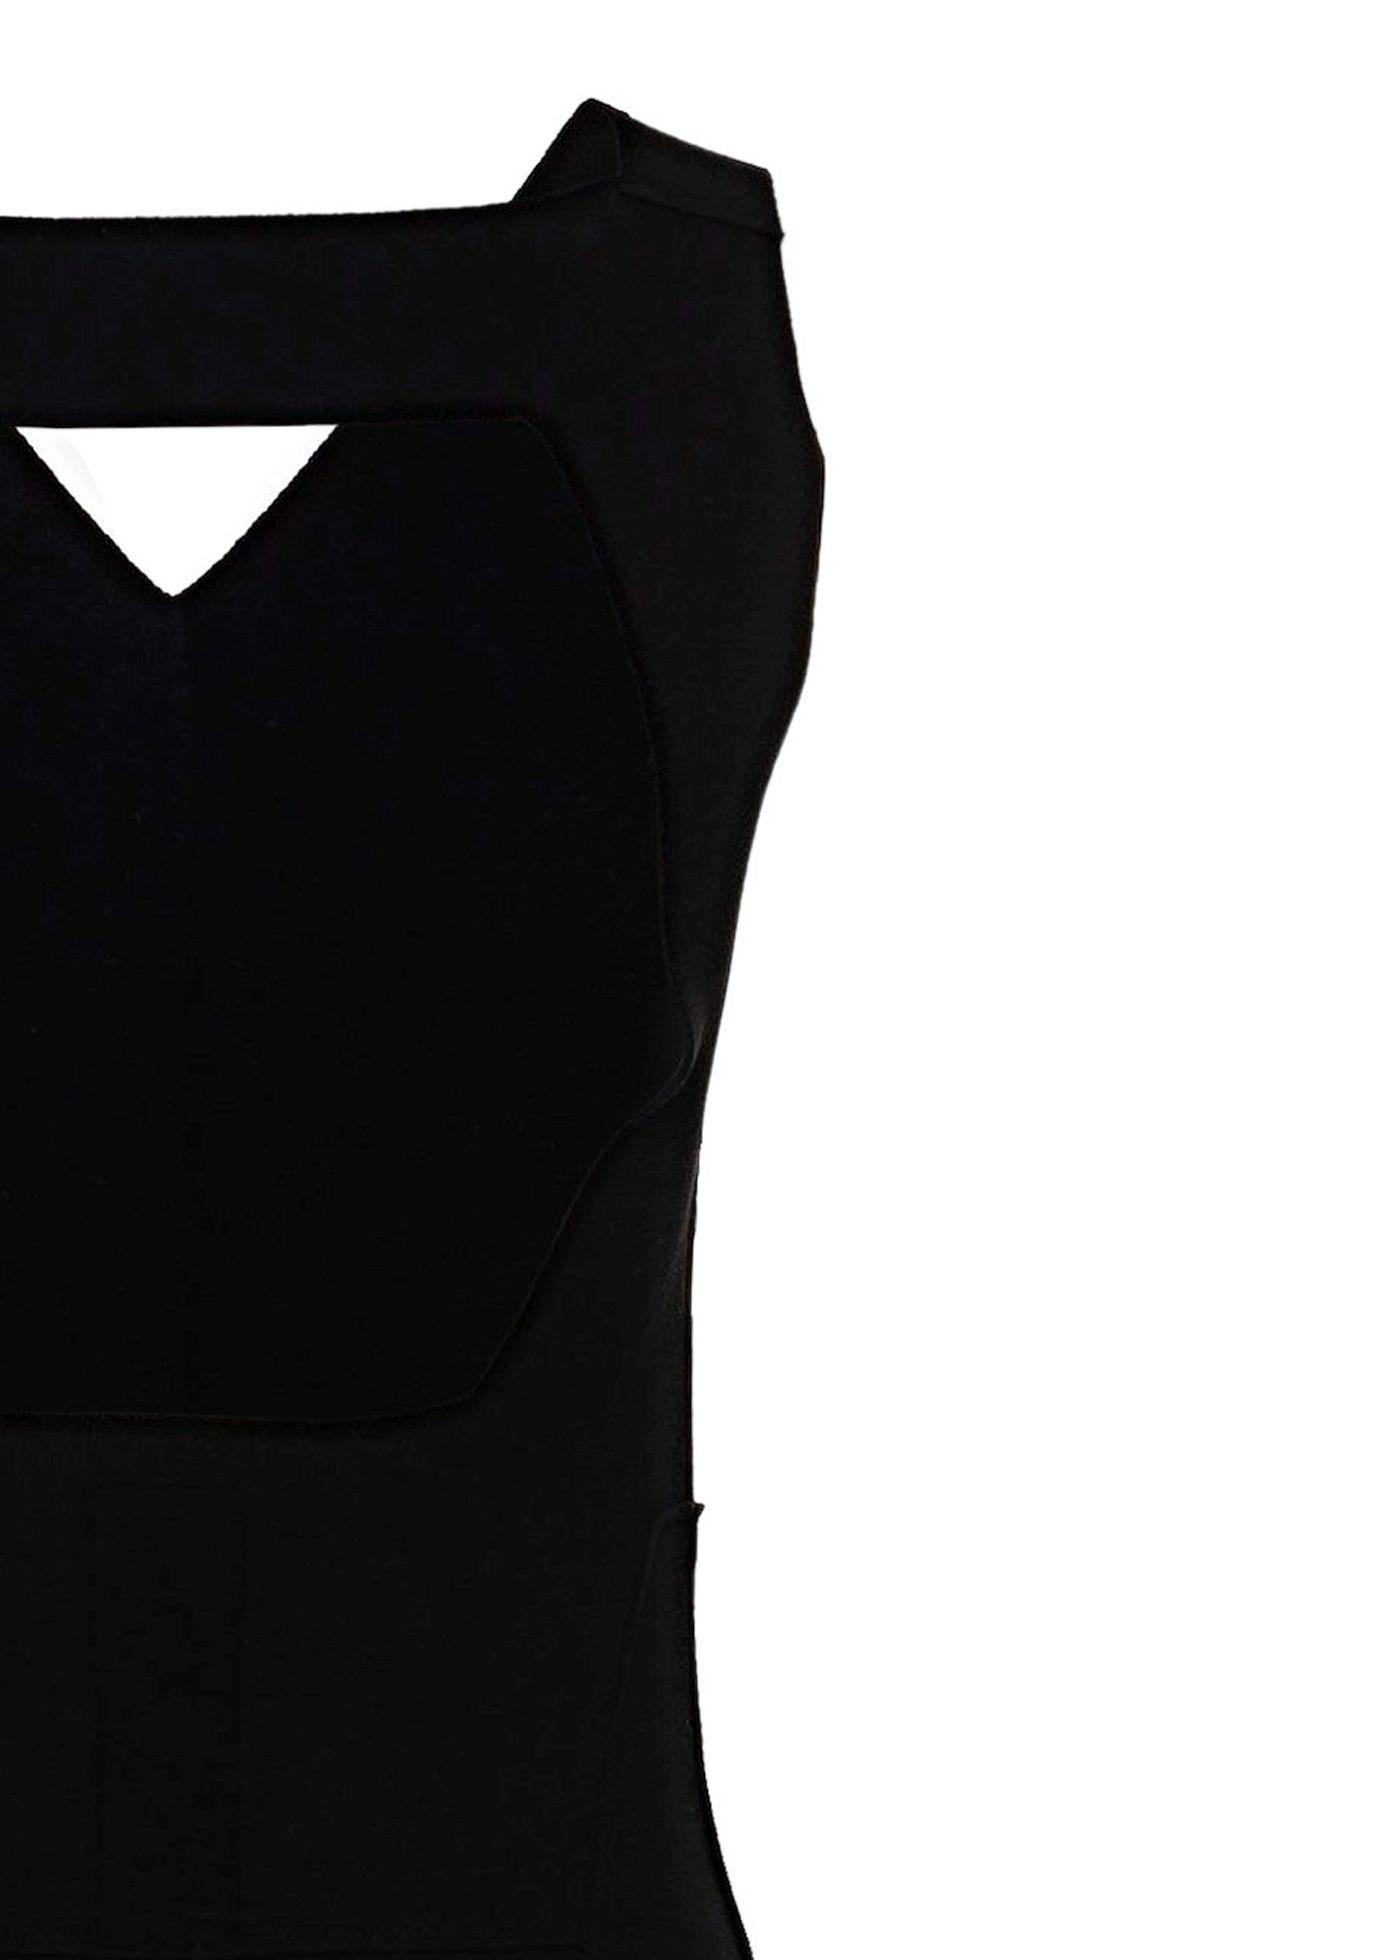 ABITO IN MAGLIA - V DRESS image number 3